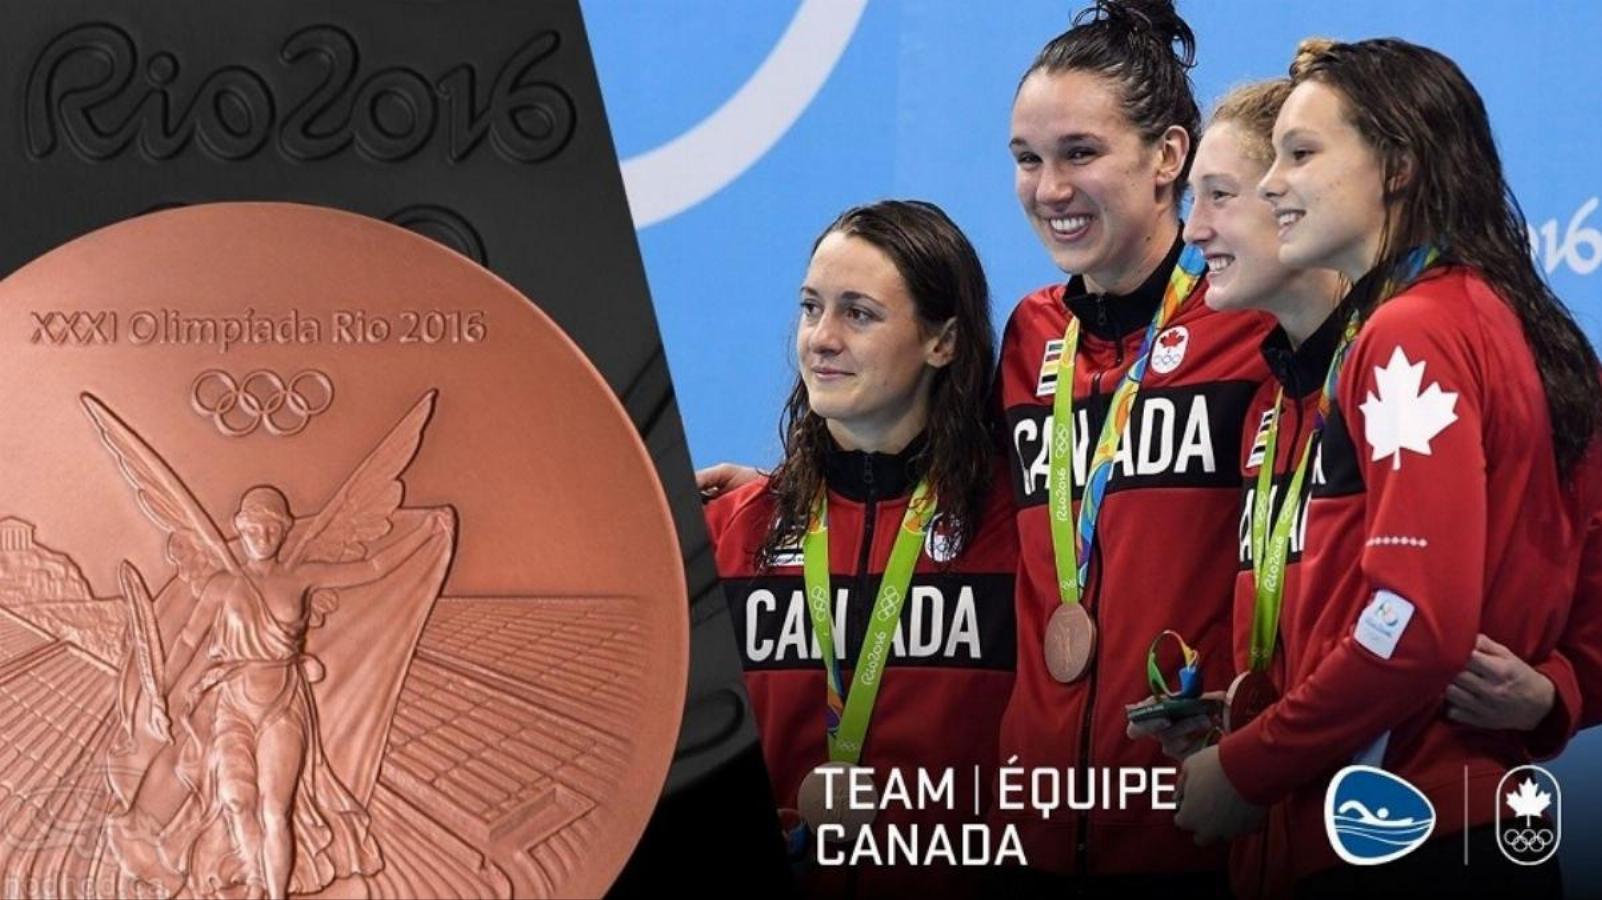 المپیک ریو 2016، نتایج تیم کانادا در اولین روز  و کسب اولین مدال